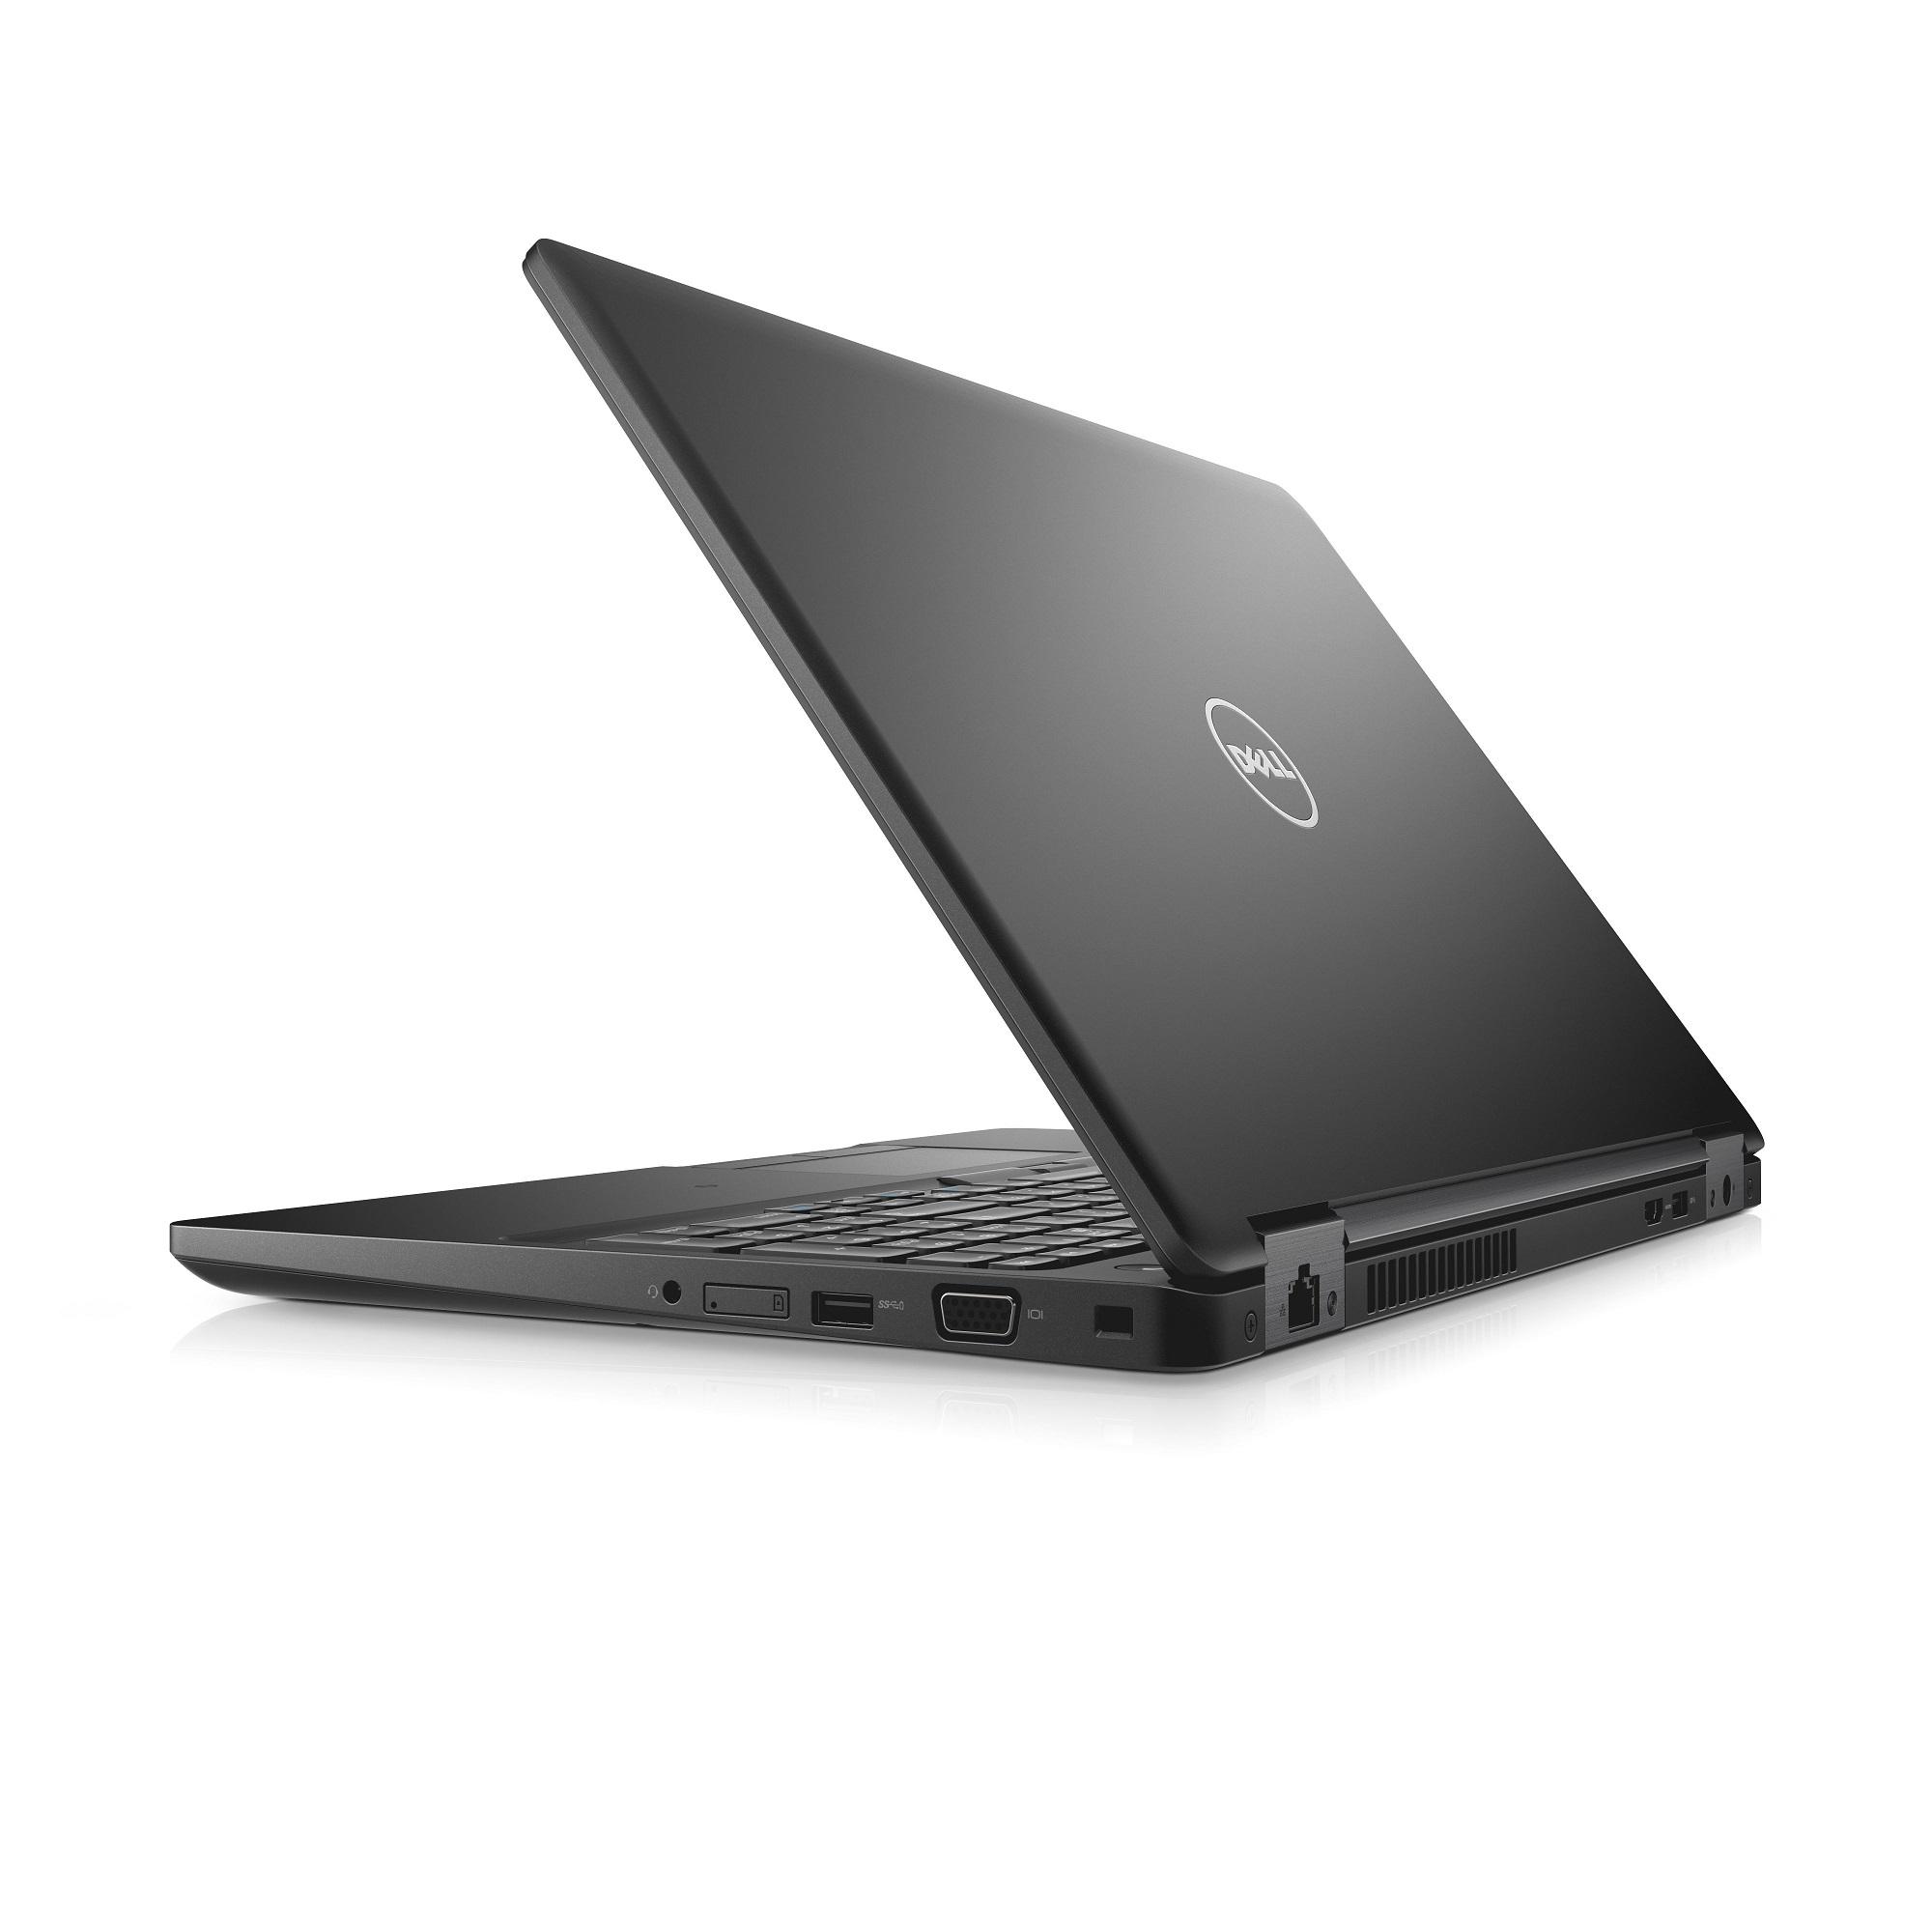 "Dell Latitude 5580 15"" FHD i5-7200U/8GB/500GB/MCR/HDMI/VGA/USB-C/W10P/3RNBD/Černý"